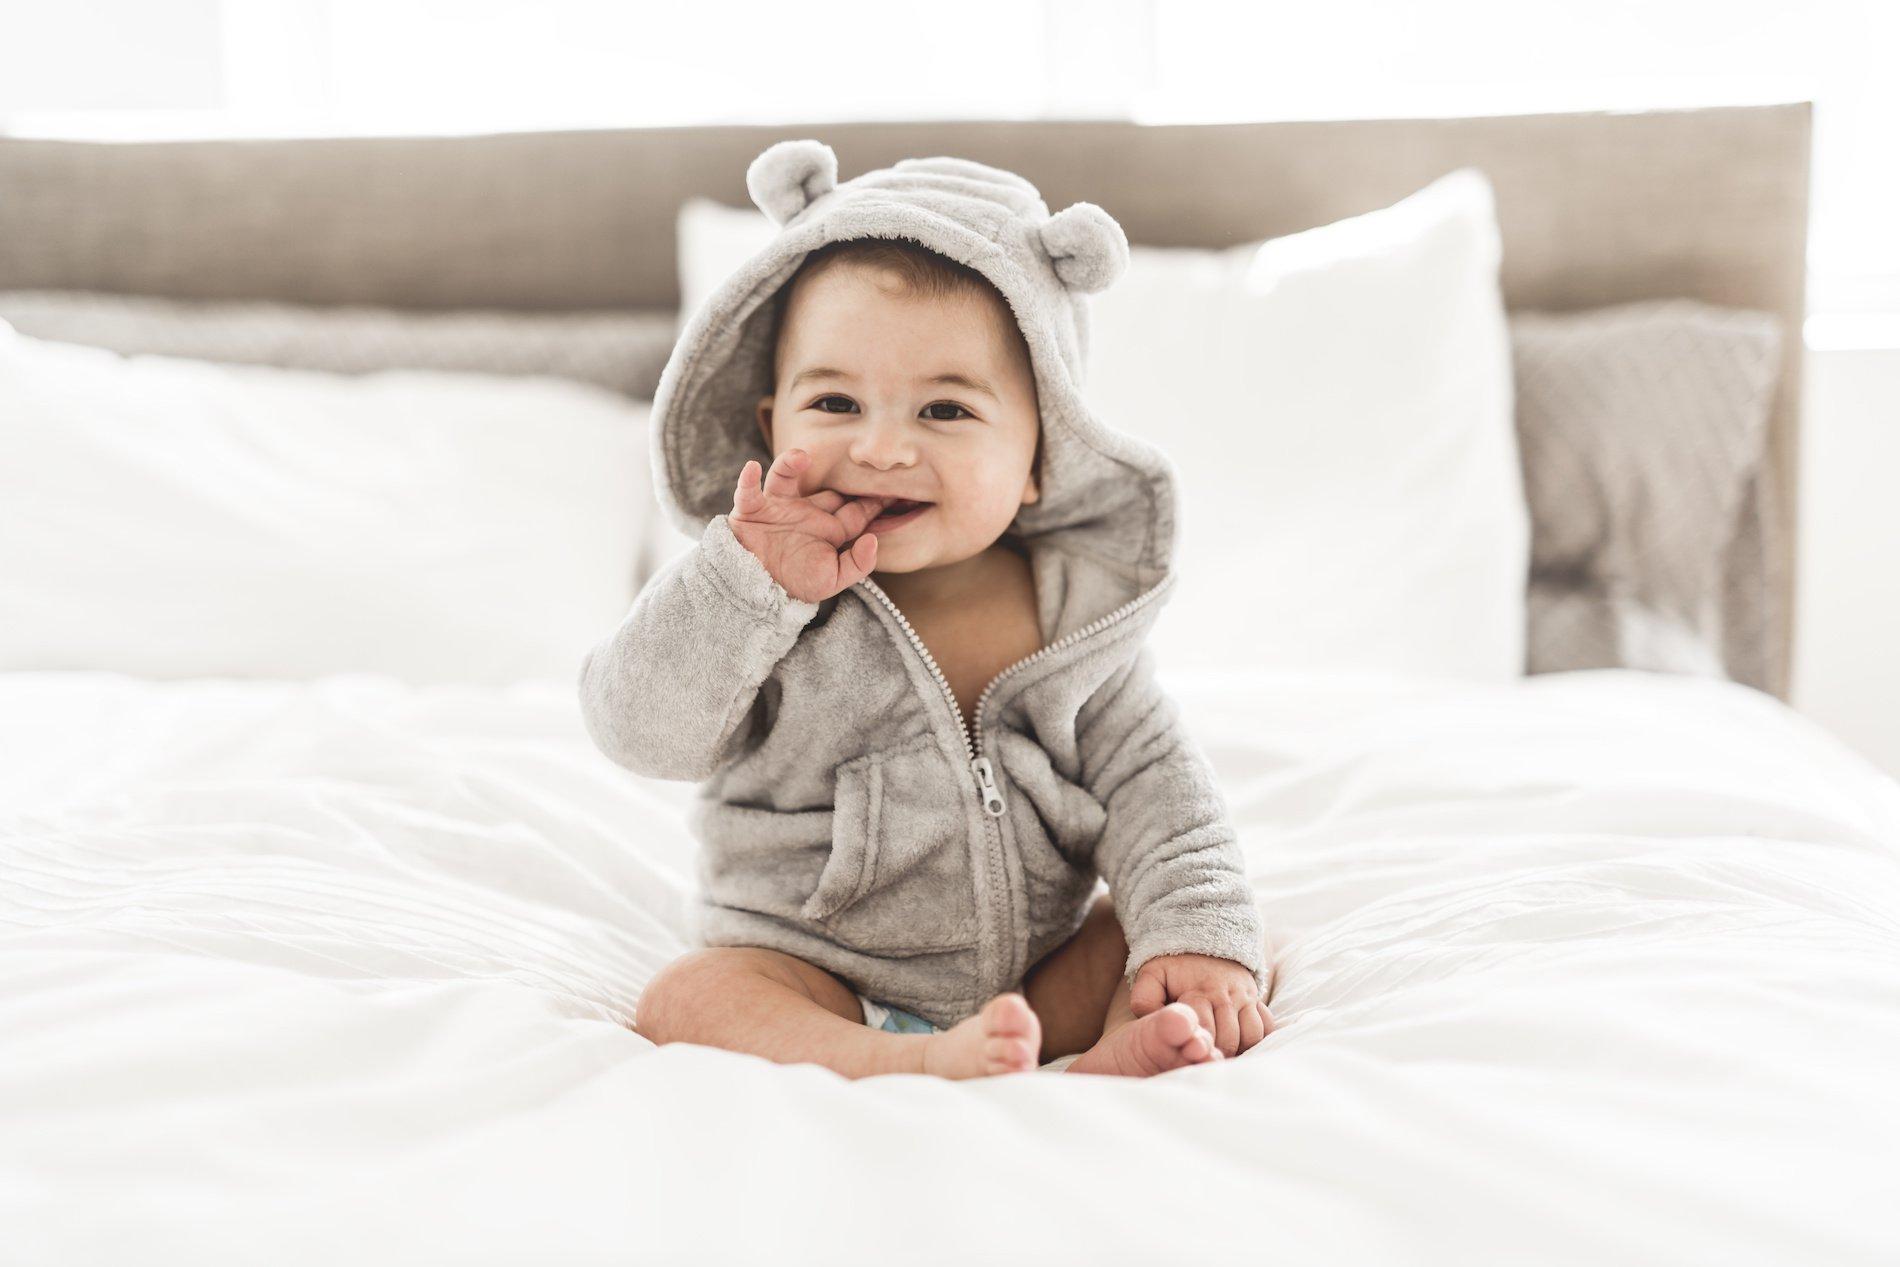 Baby wearing a jacket - Good Little Sleeperzzz